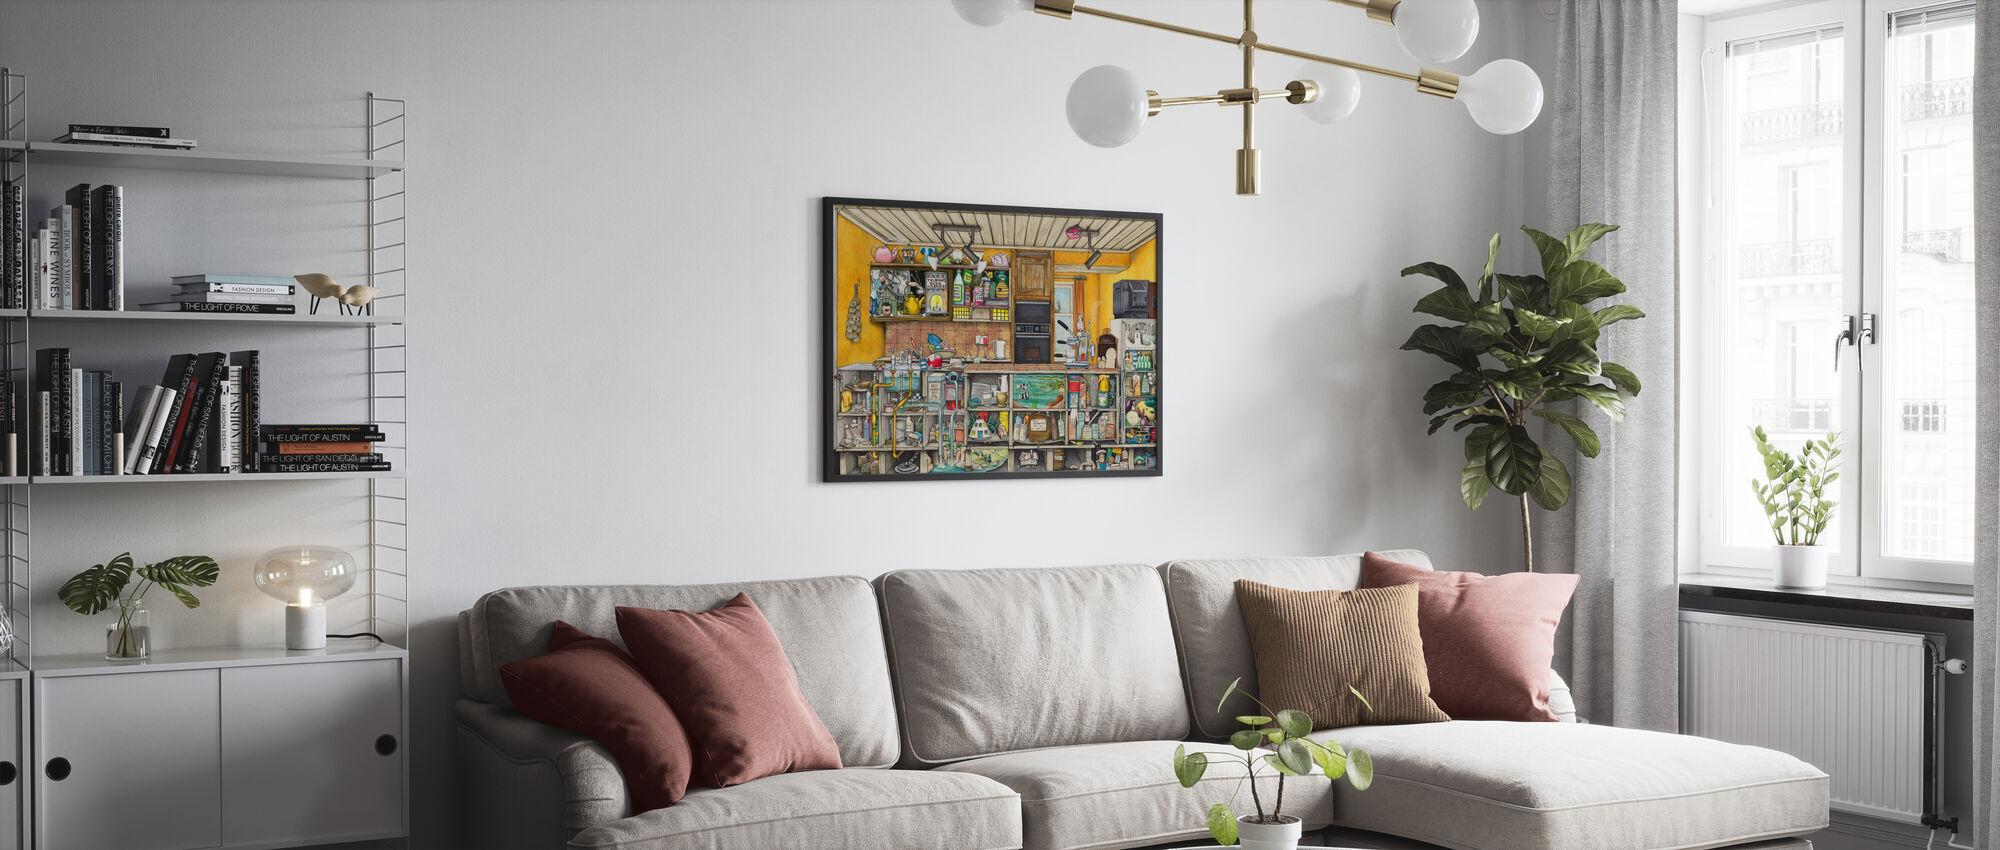 Køkkenet - Plakat - Stue